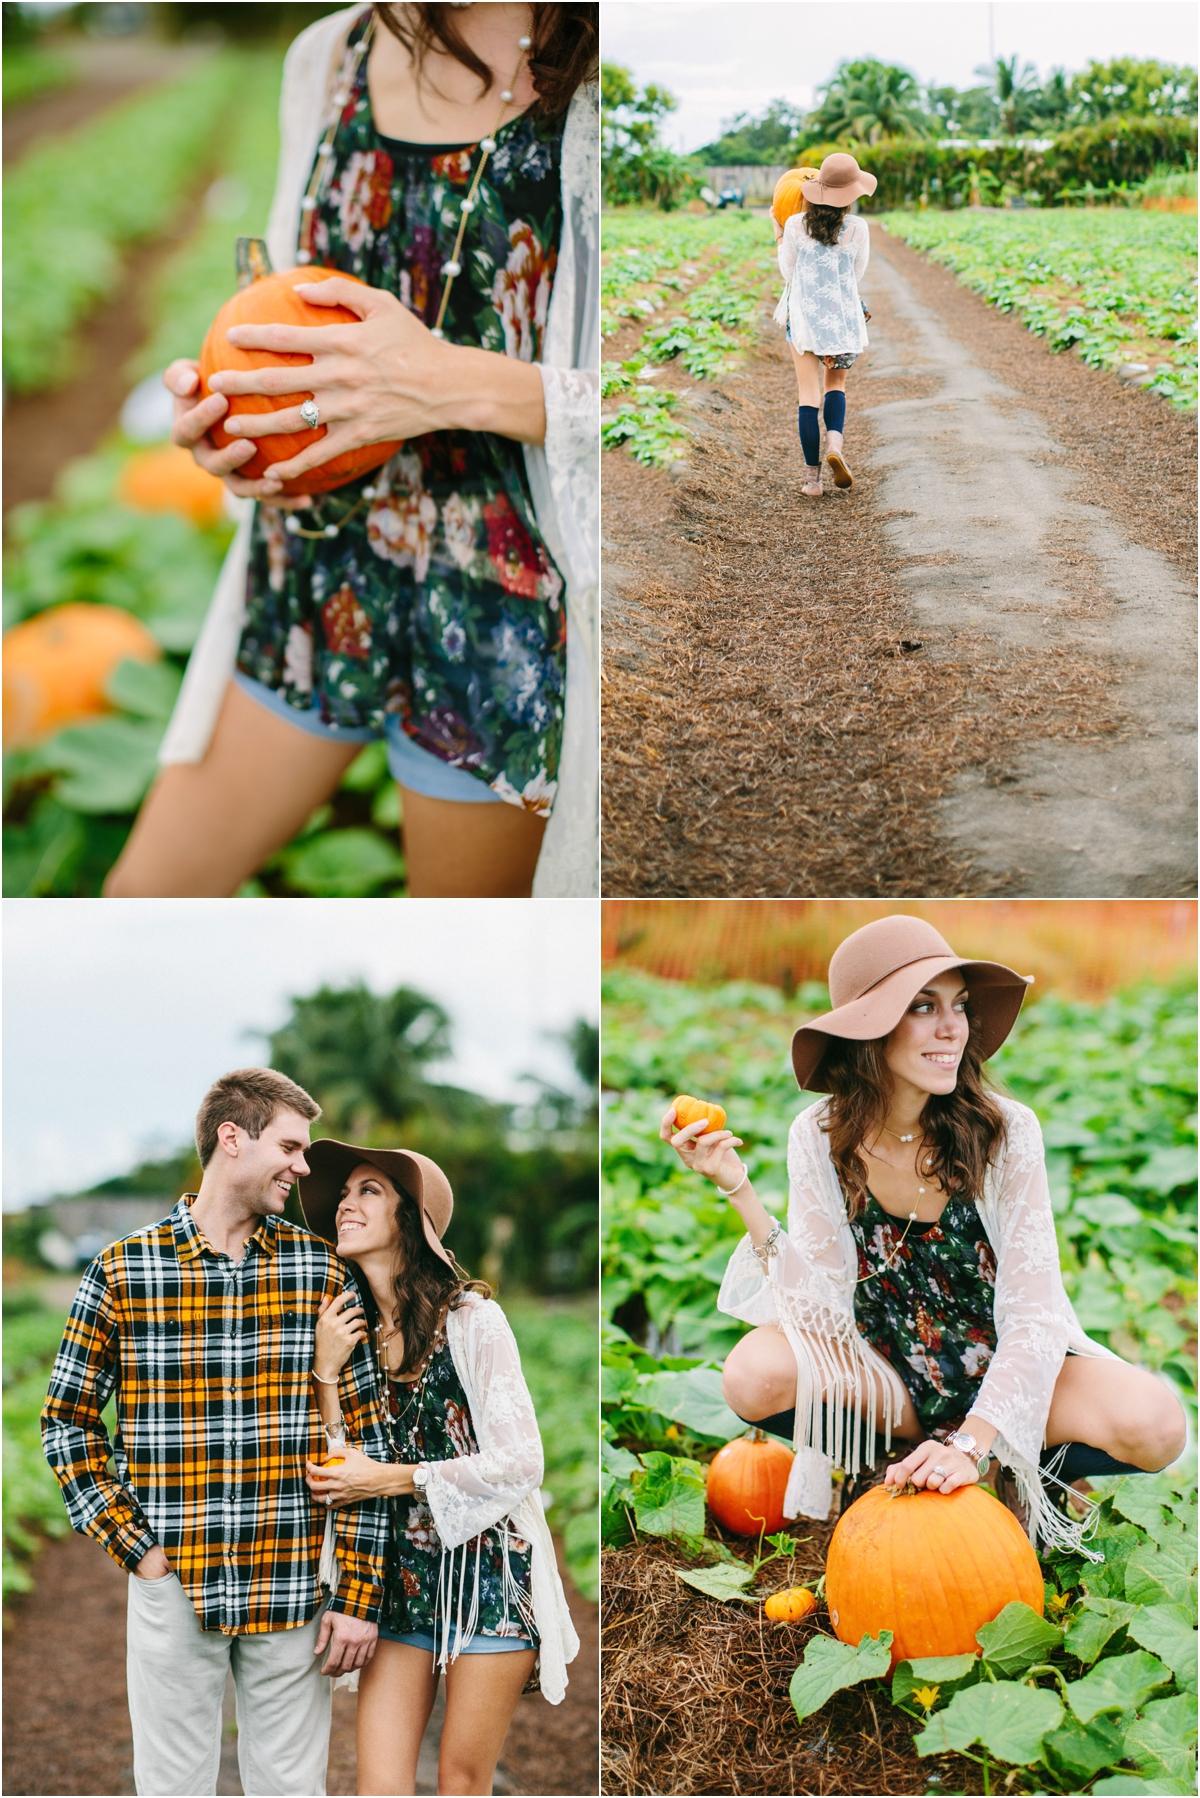 Boynton_Beach_Florida_Engagement_Photography_4